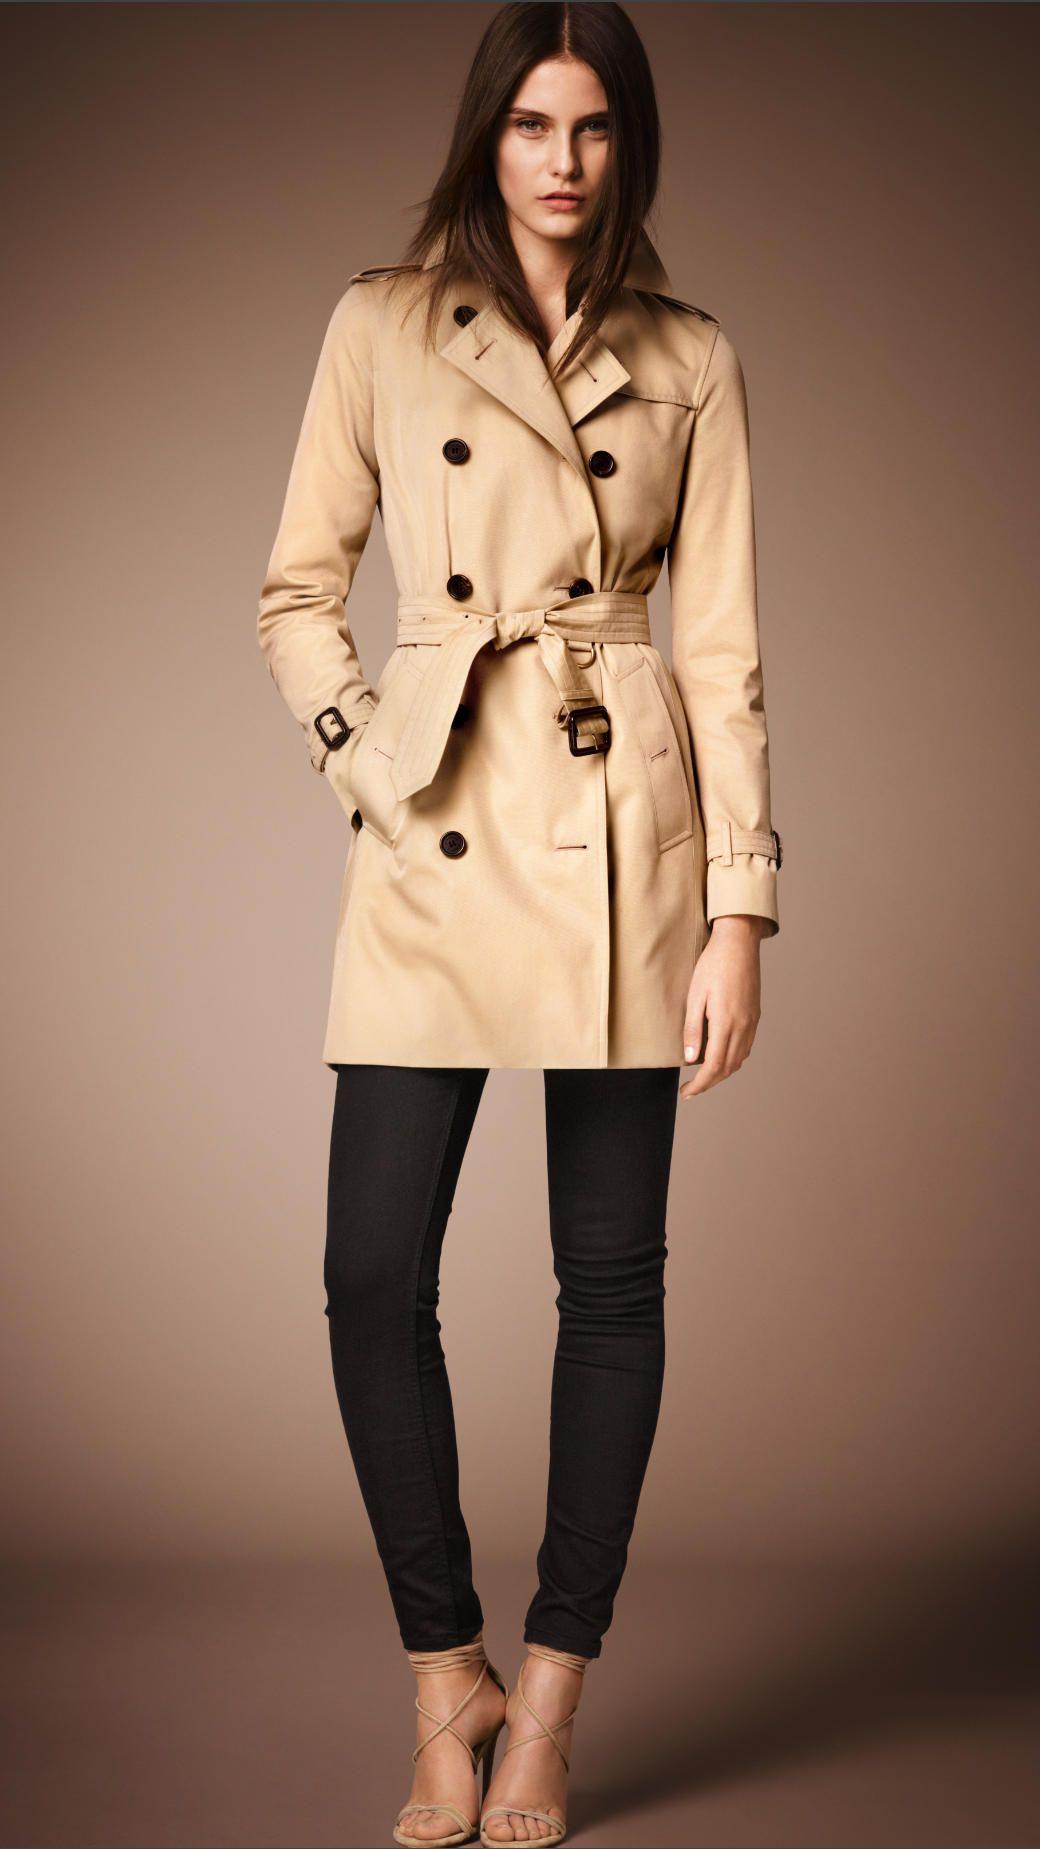 6348475aa36586 The Kensington – Mid-length Trench Coat in Honey - Women